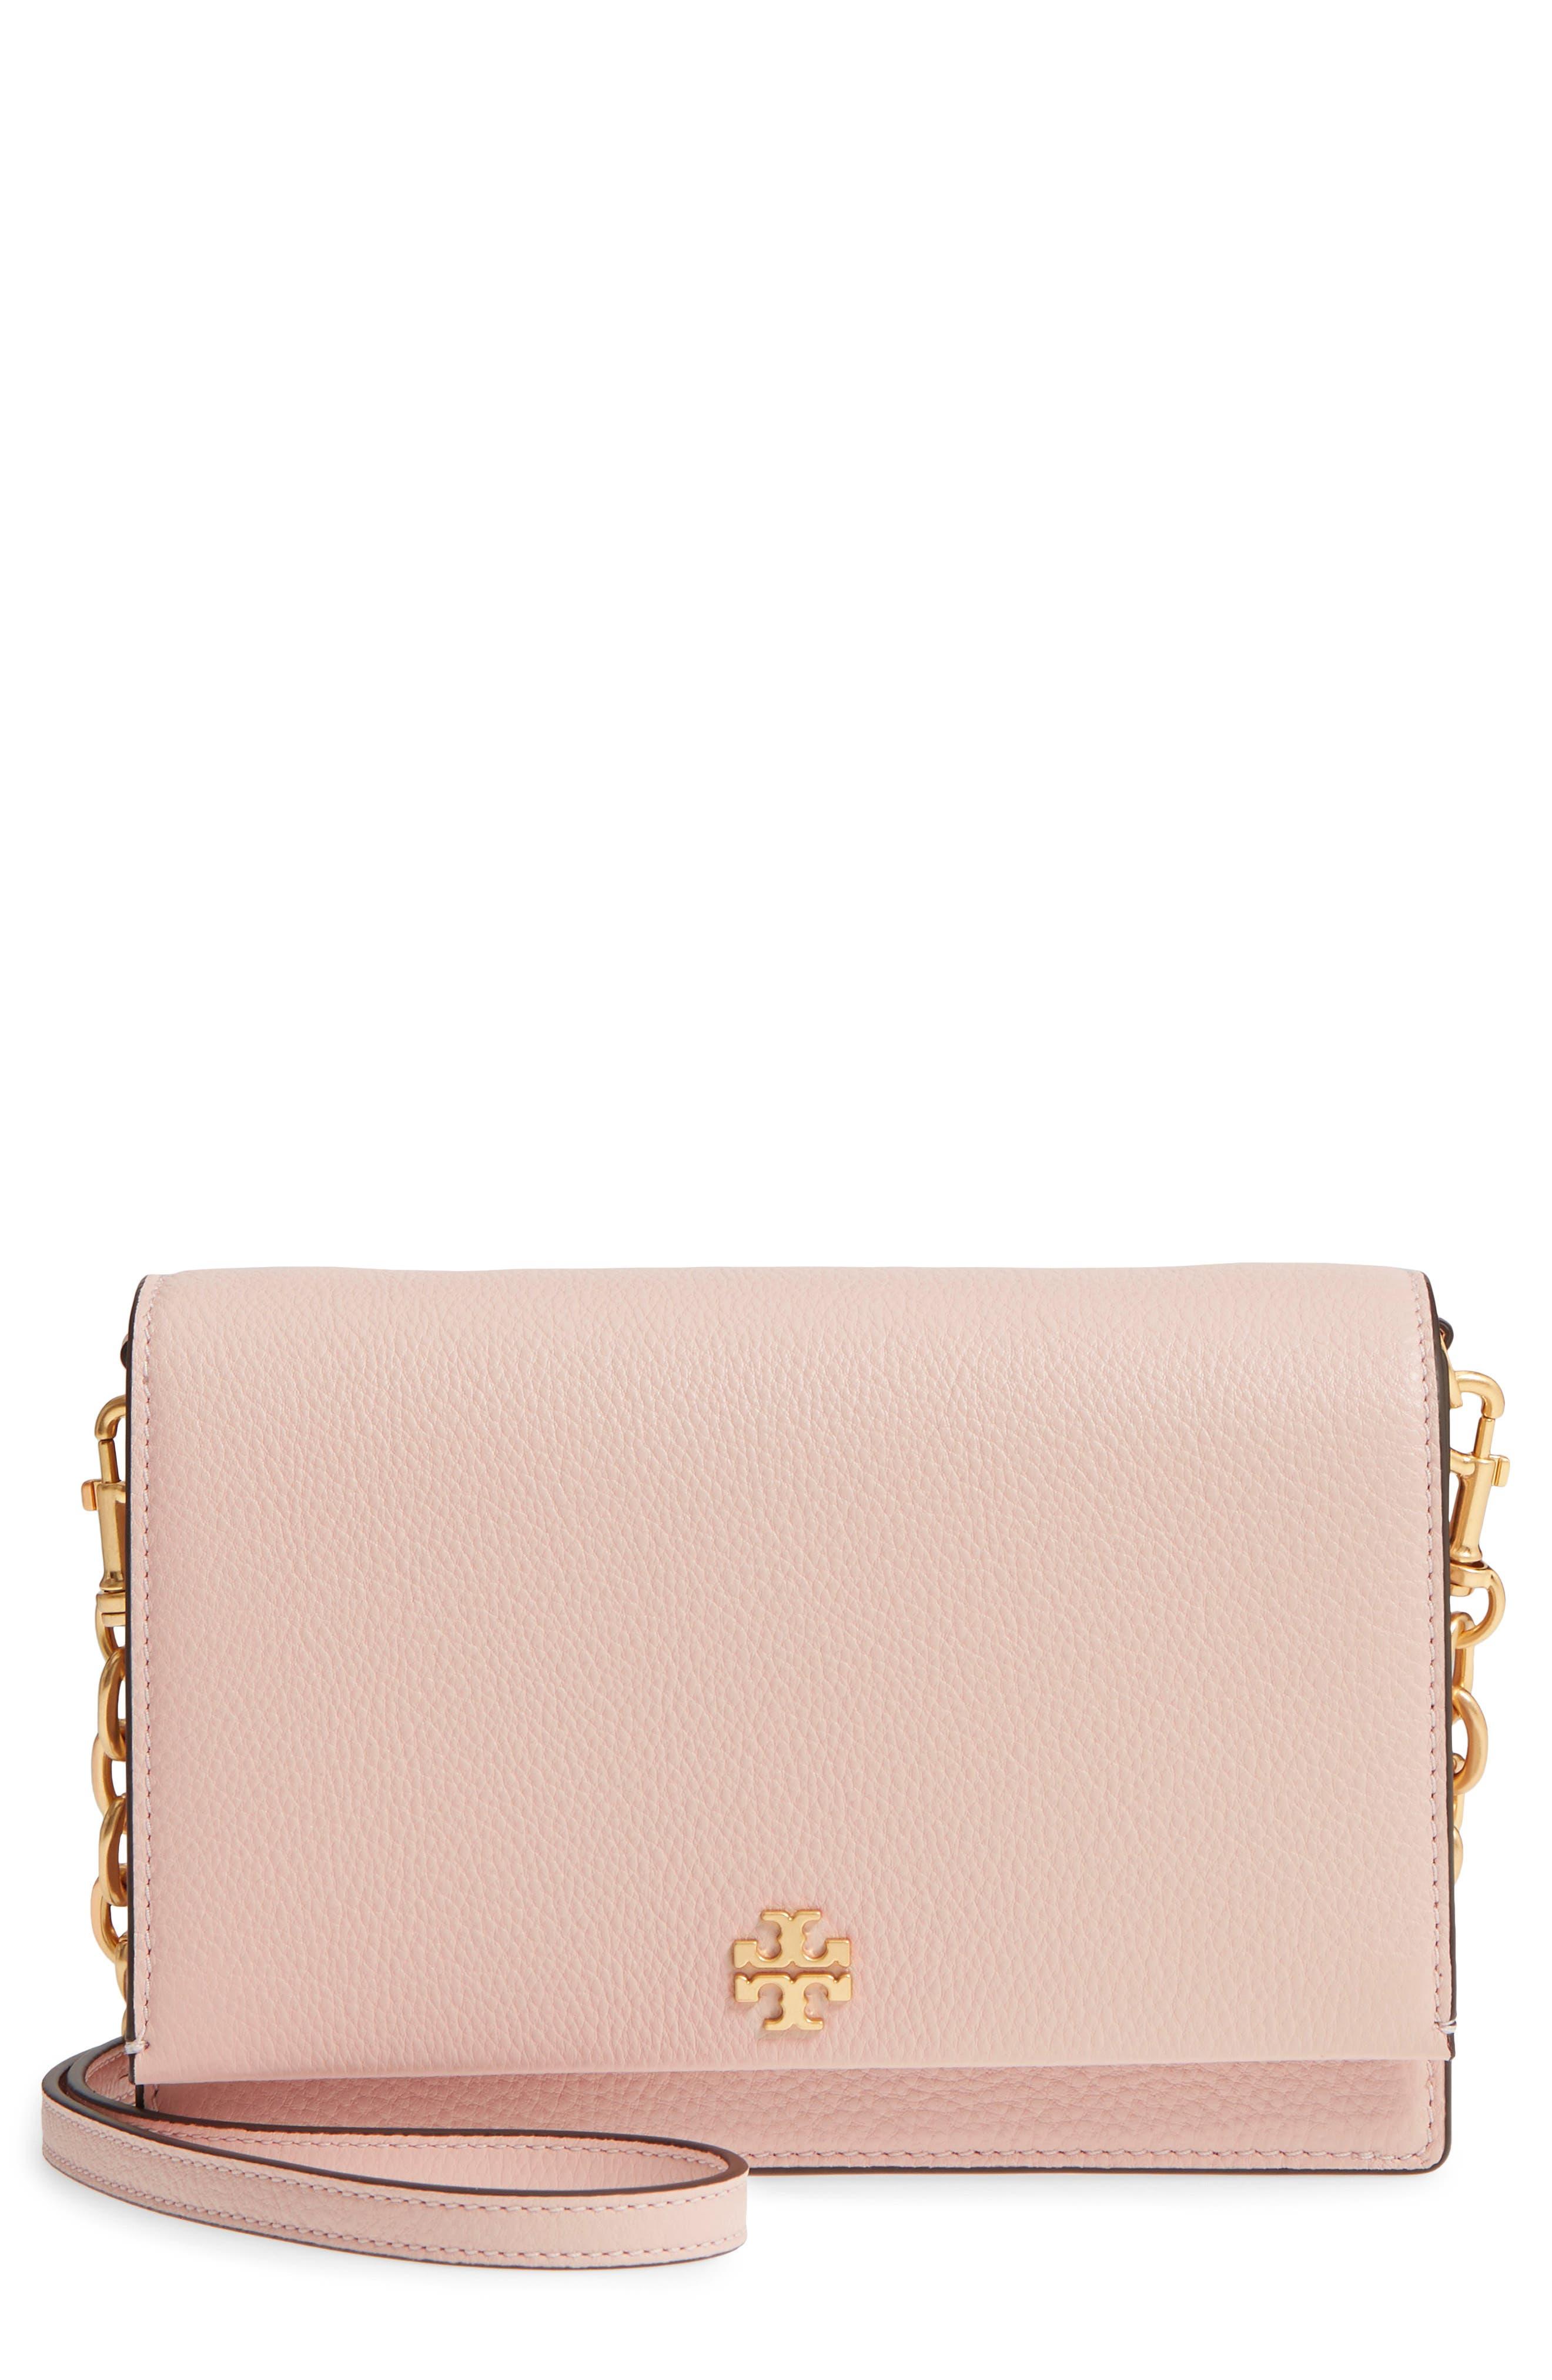 Georgia Pebble Leather Shoulder Bag,                             Main thumbnail 1, color,                             Shell Pink